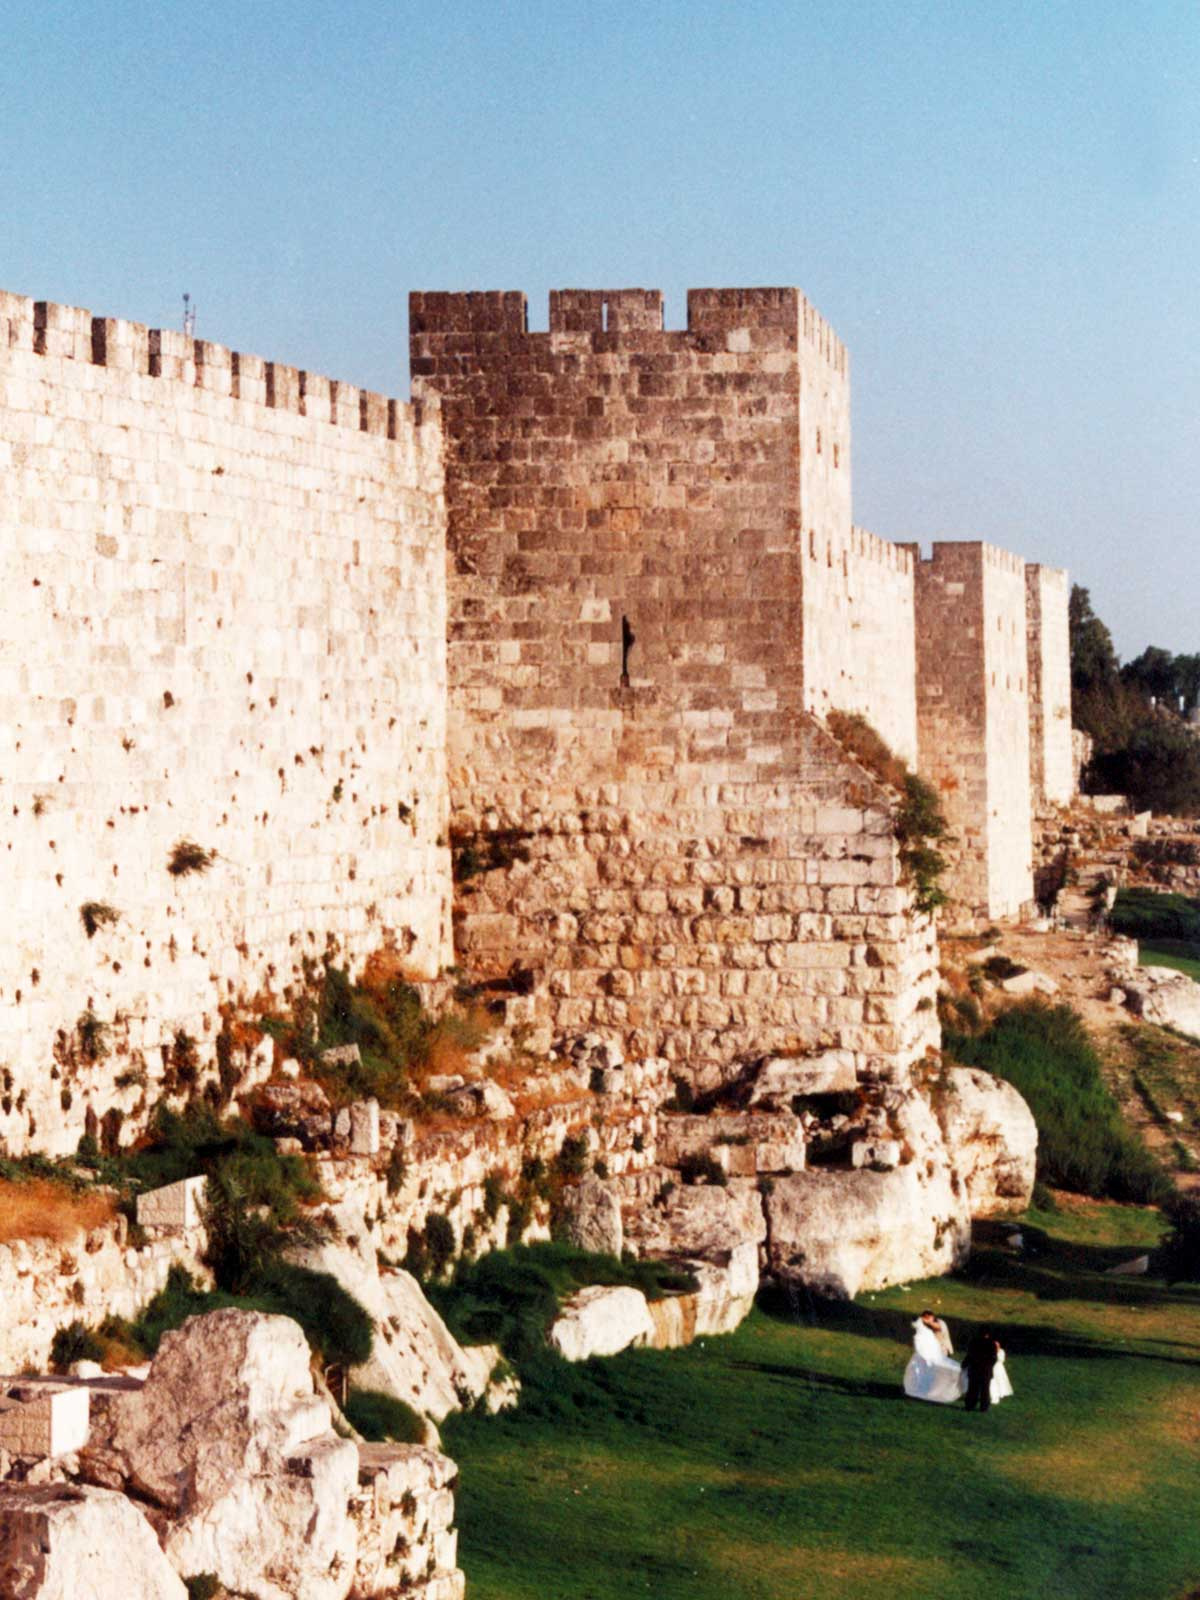 Jerusalem city wall | Israel | Dr Steven A Martin | International Education Online | Middle East